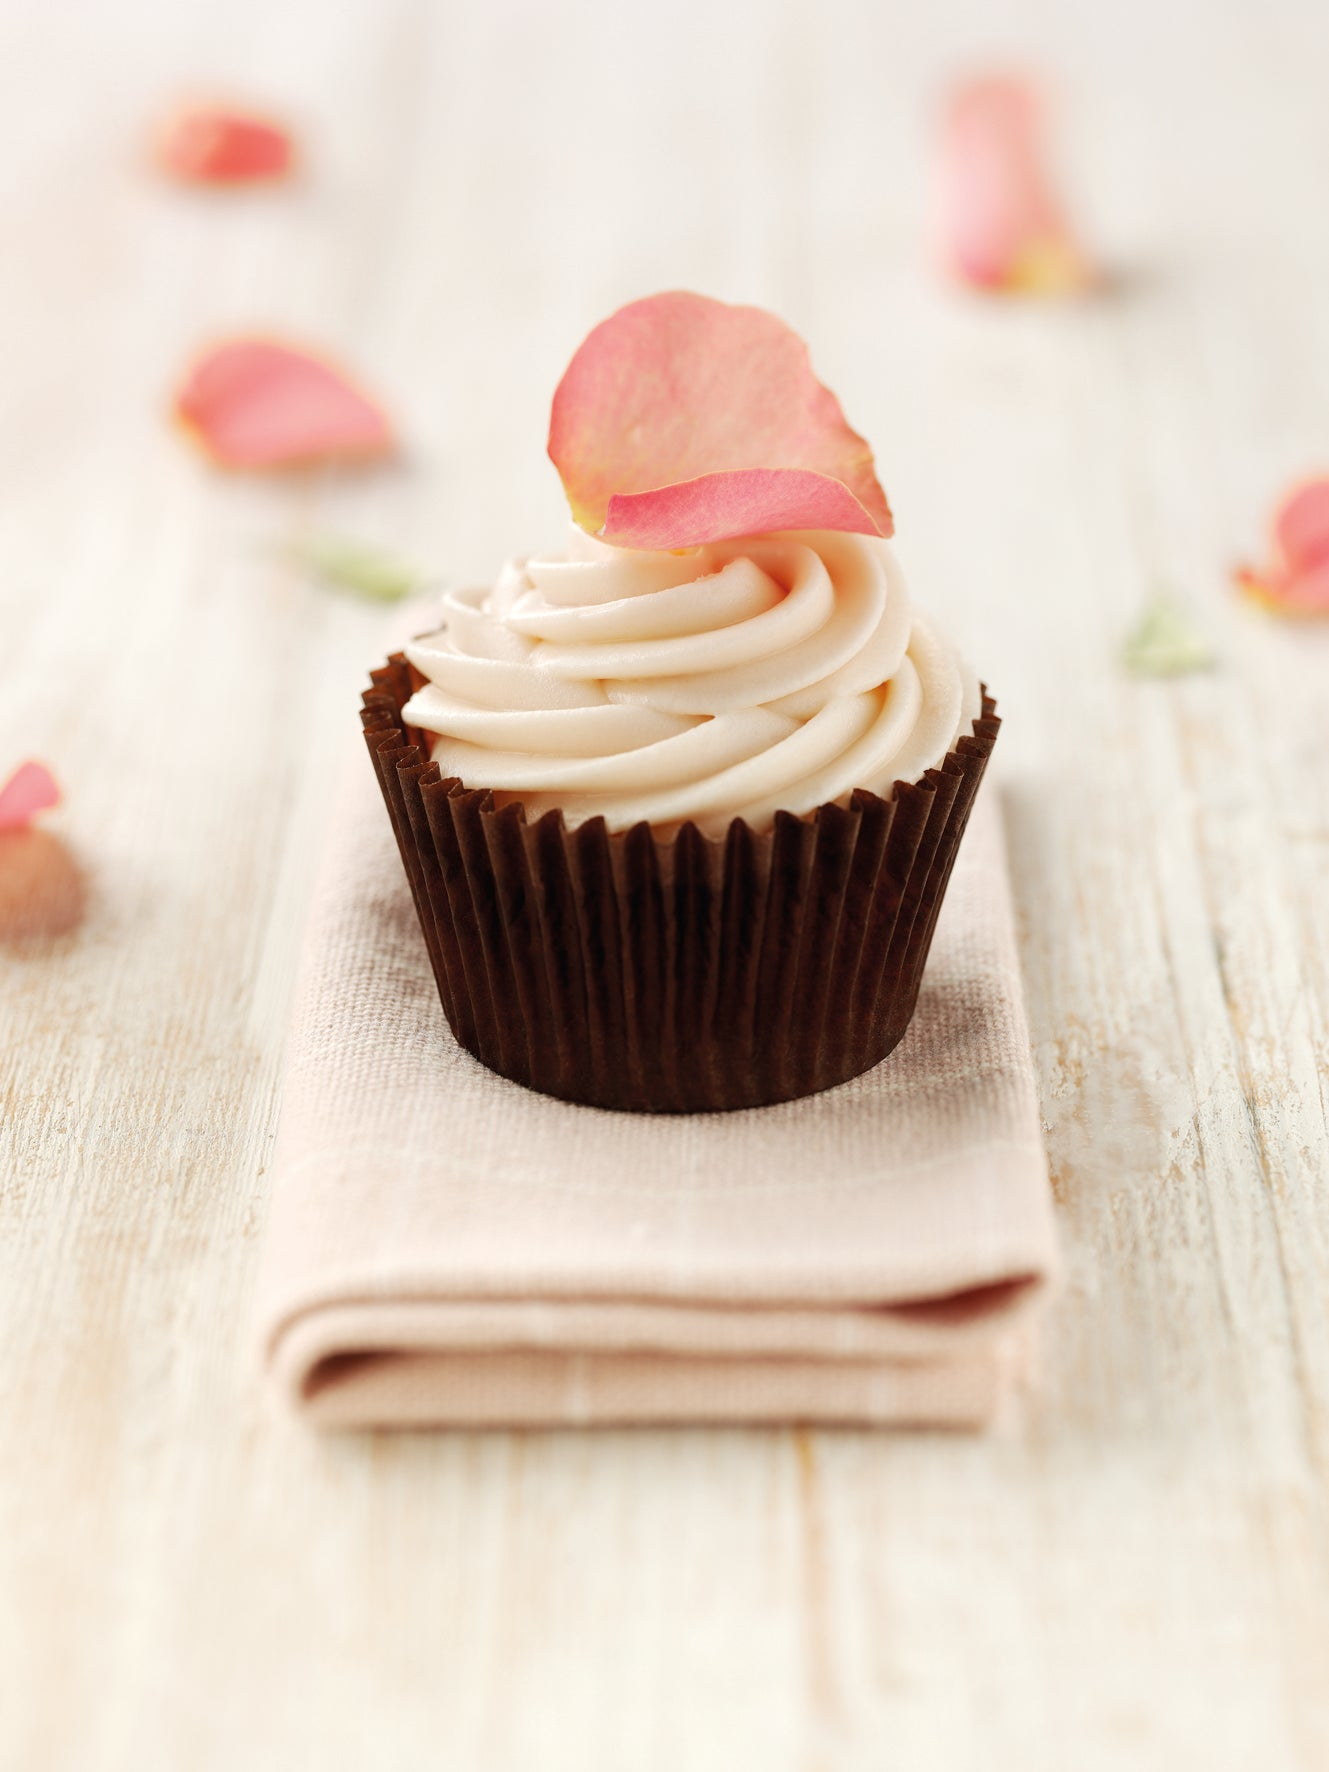 Nielsen-Massey-Rose-Water-Cupcake.jpg